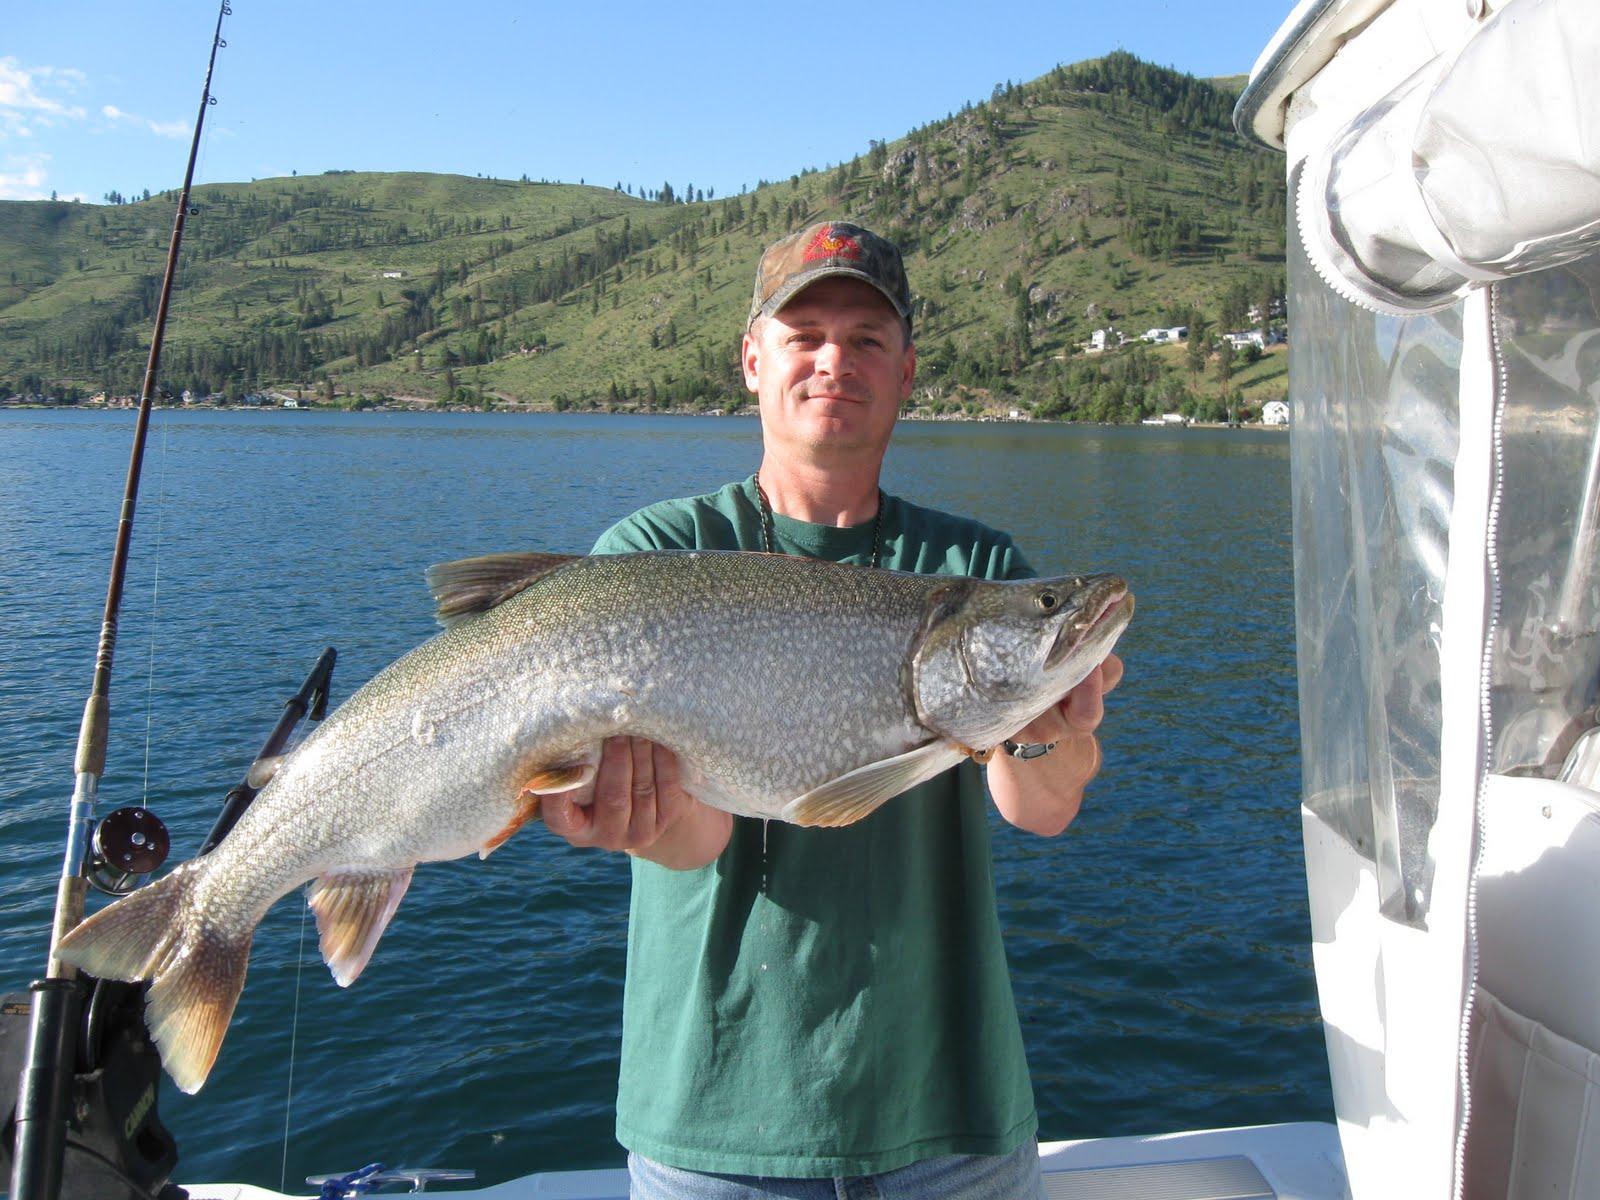 Northwest salmon and steelhead fishing lake chelan laker for Lake chelan fishing